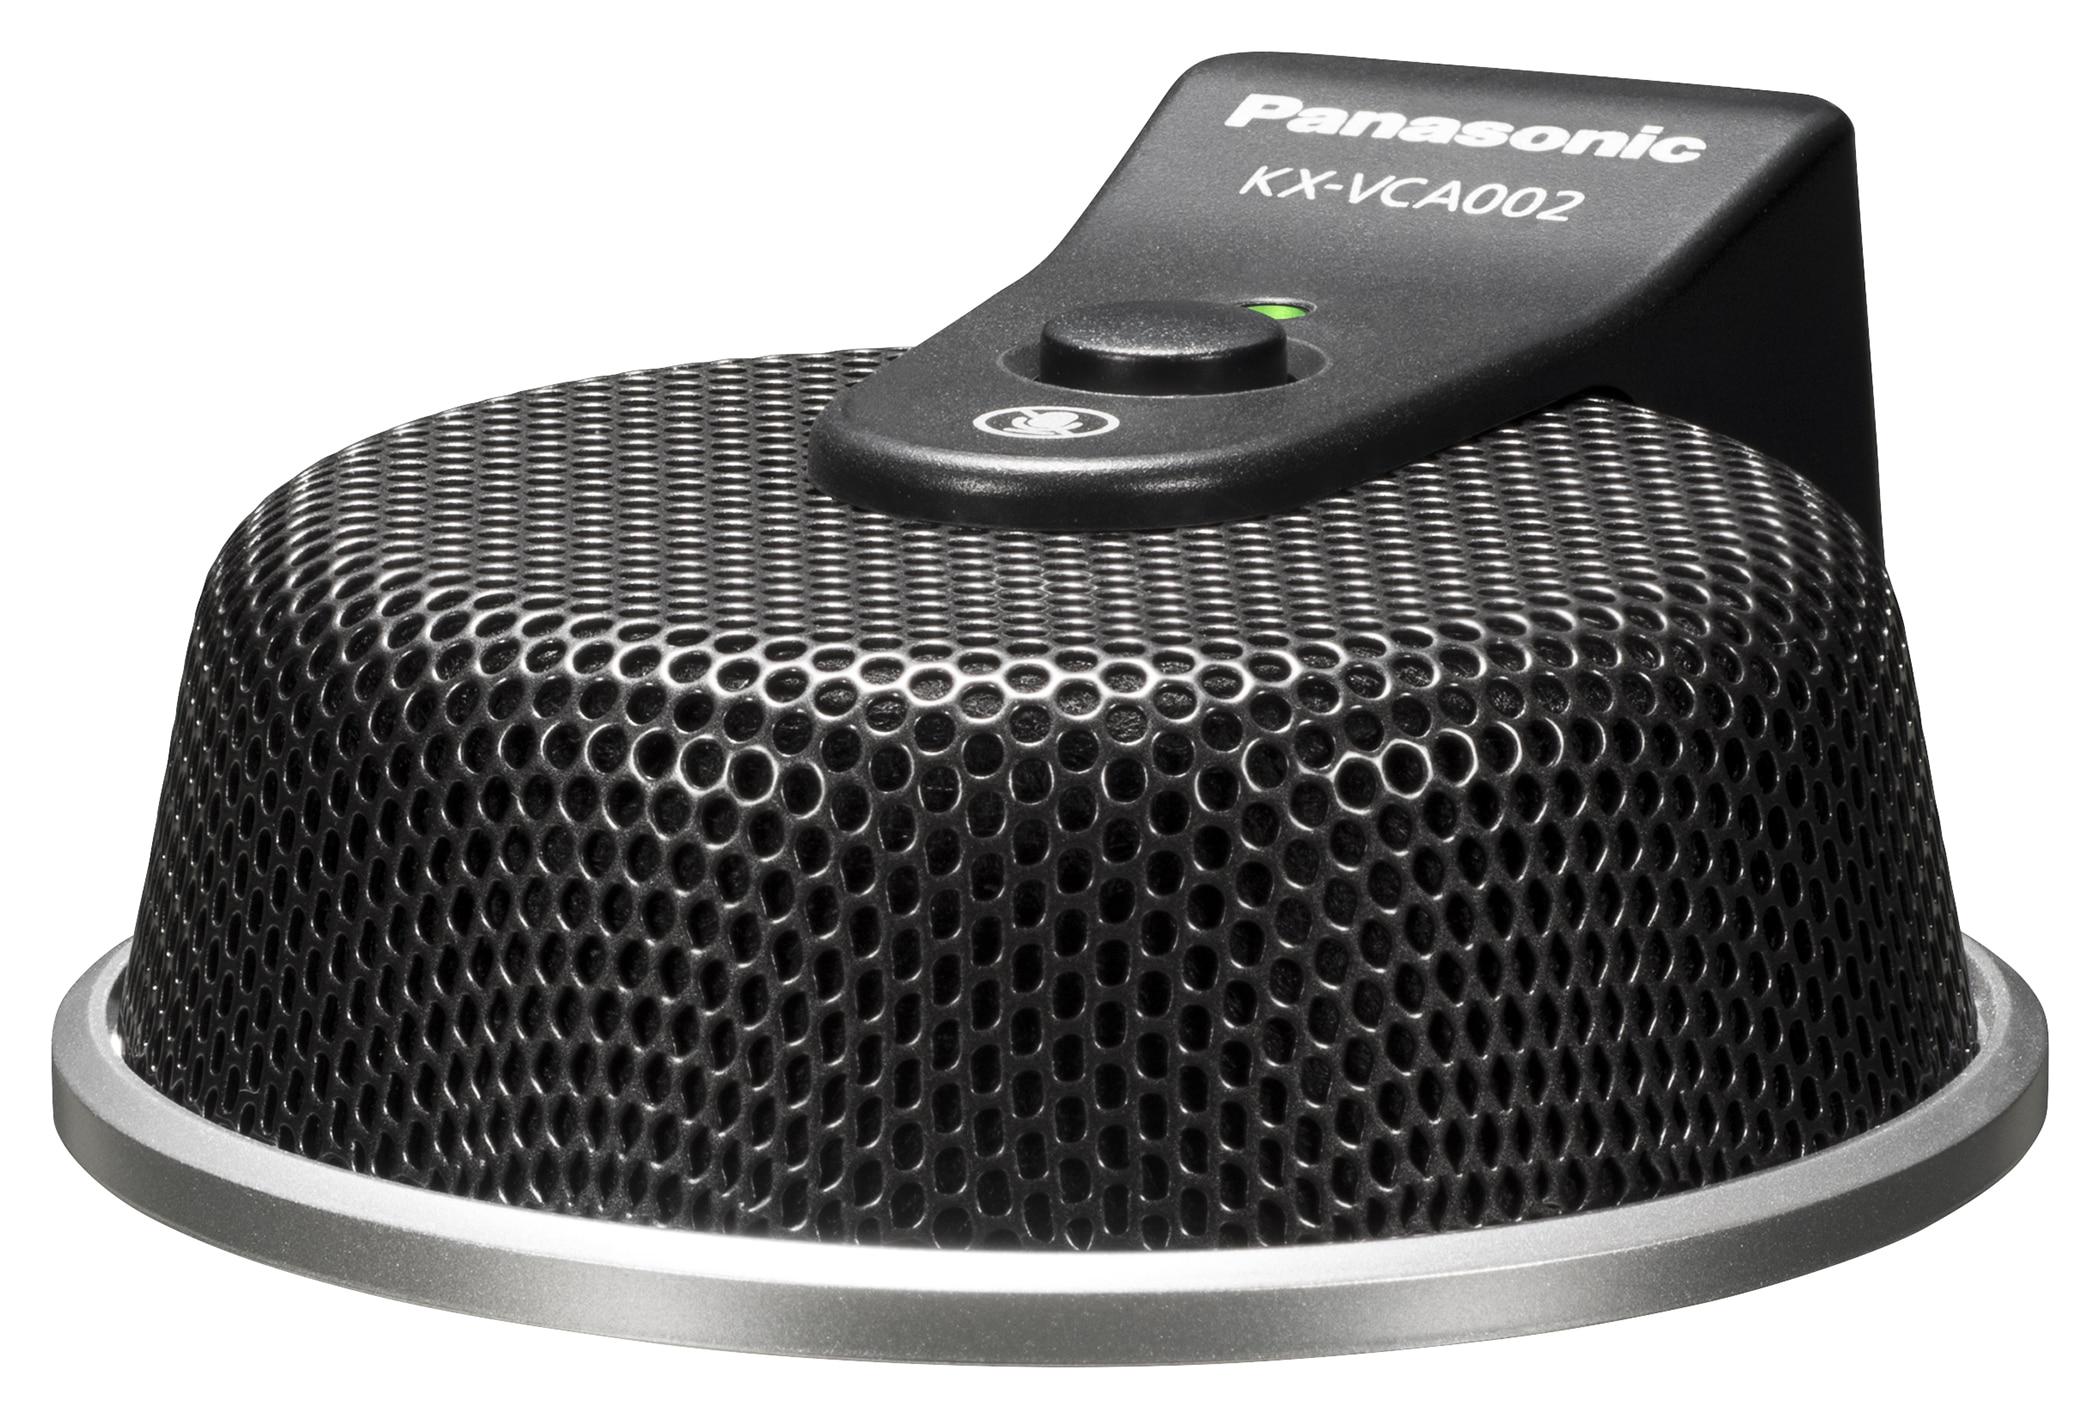 Panasonic Analogue Boundary Microphone